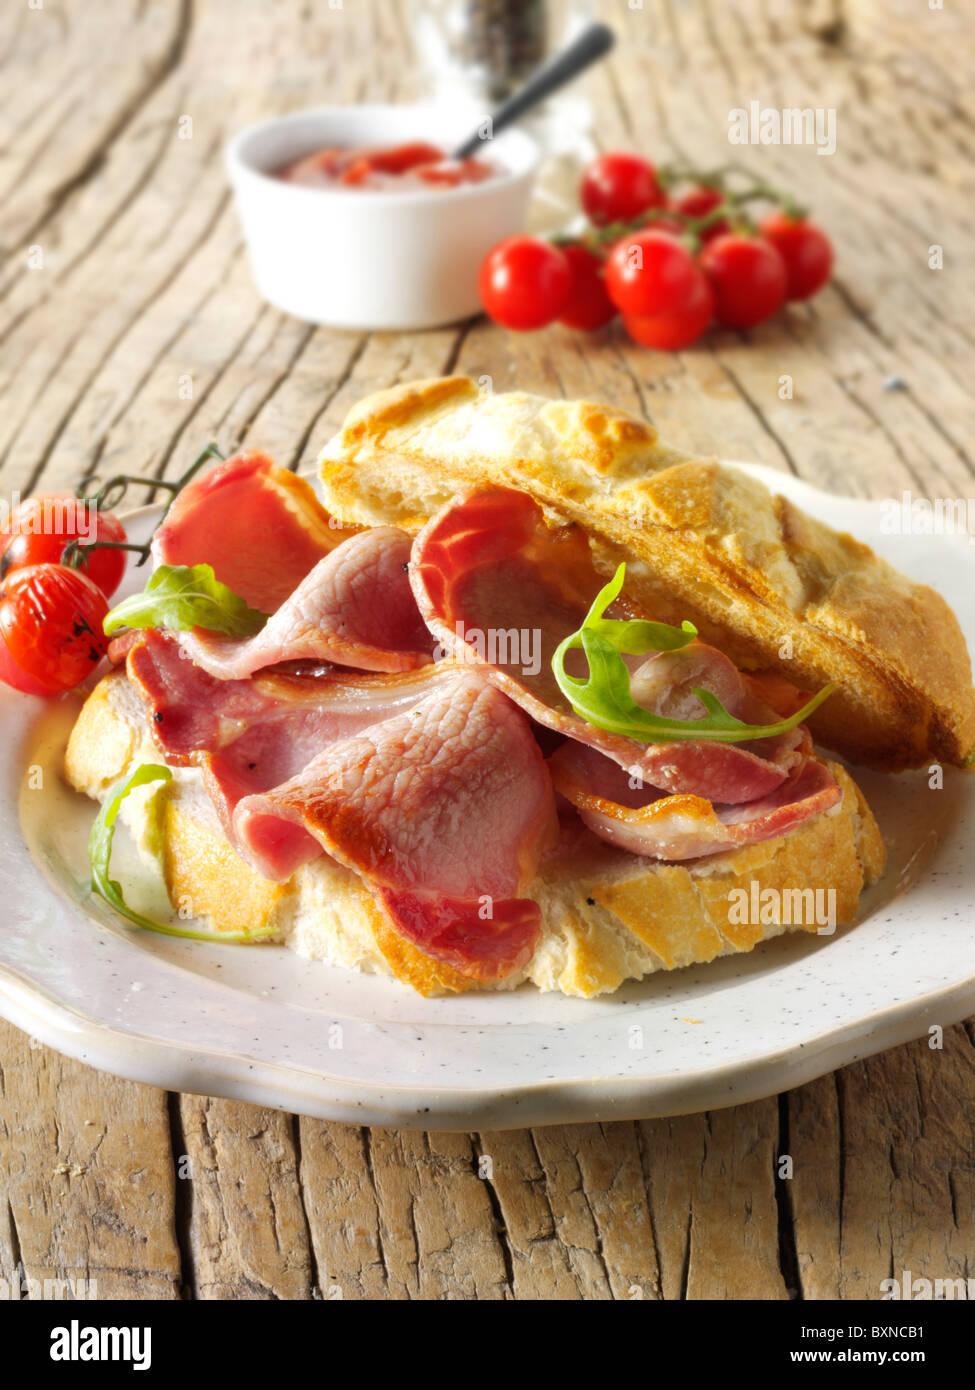 Bacon sandwich  - Stock Image